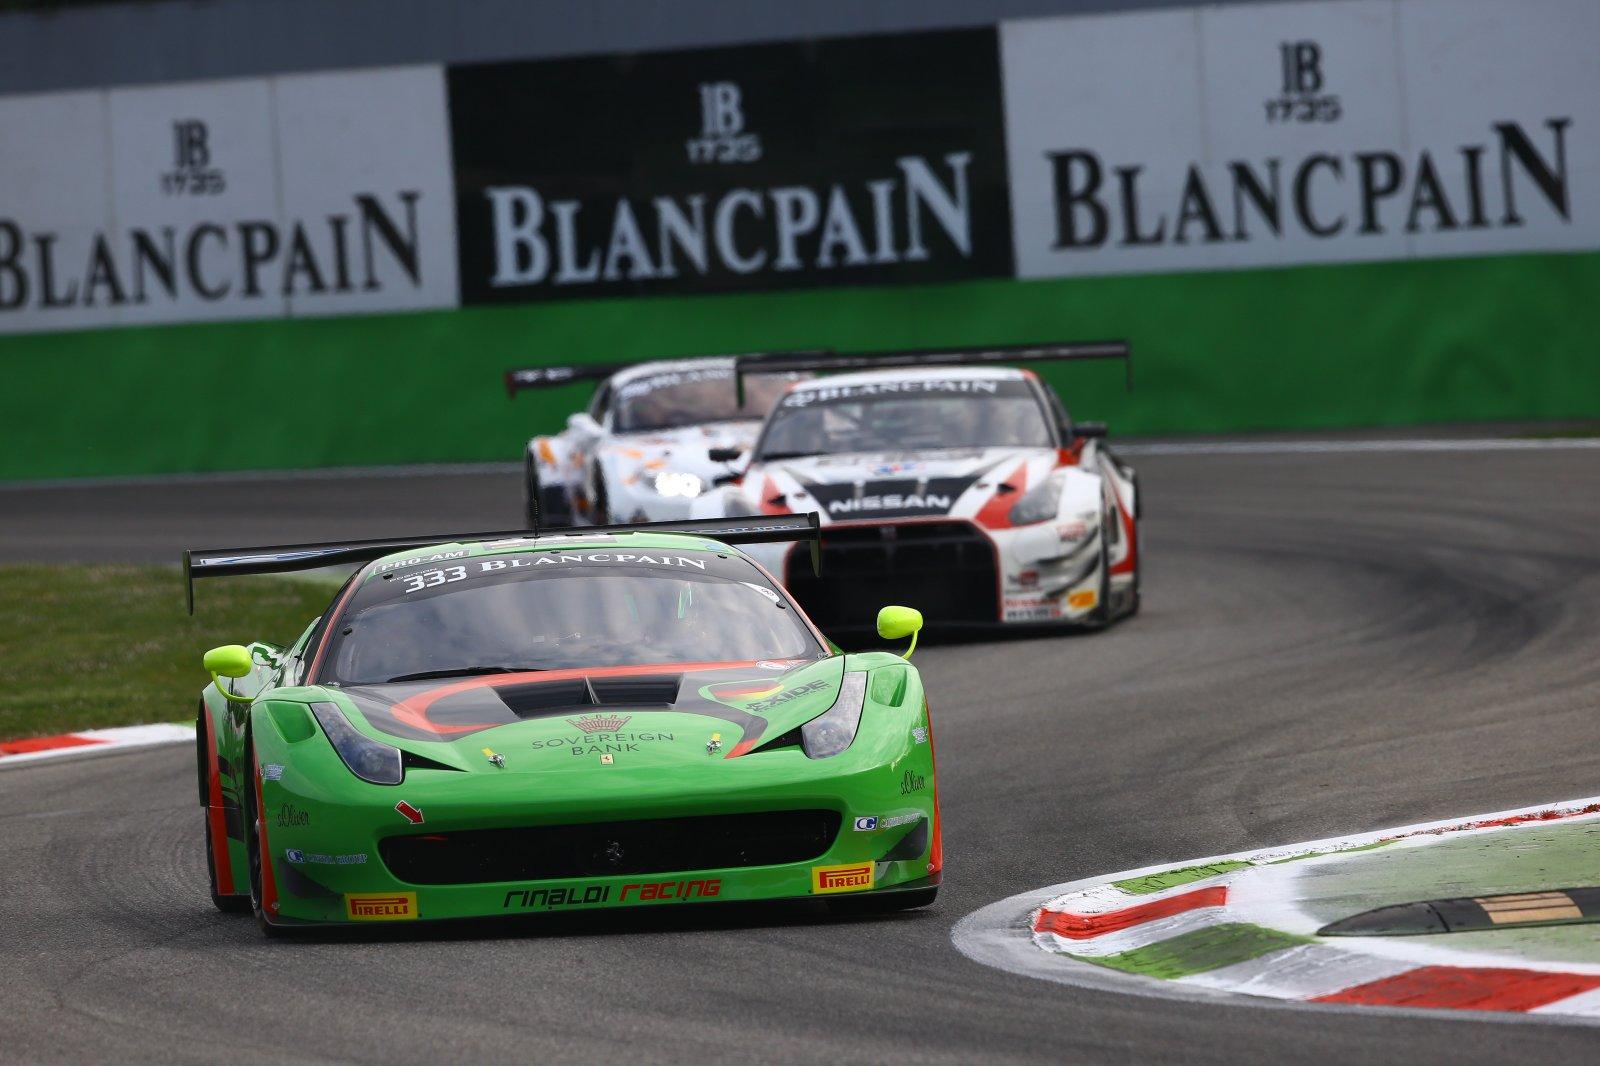 Norbert Siedler puts Ferrari on pole in Monza